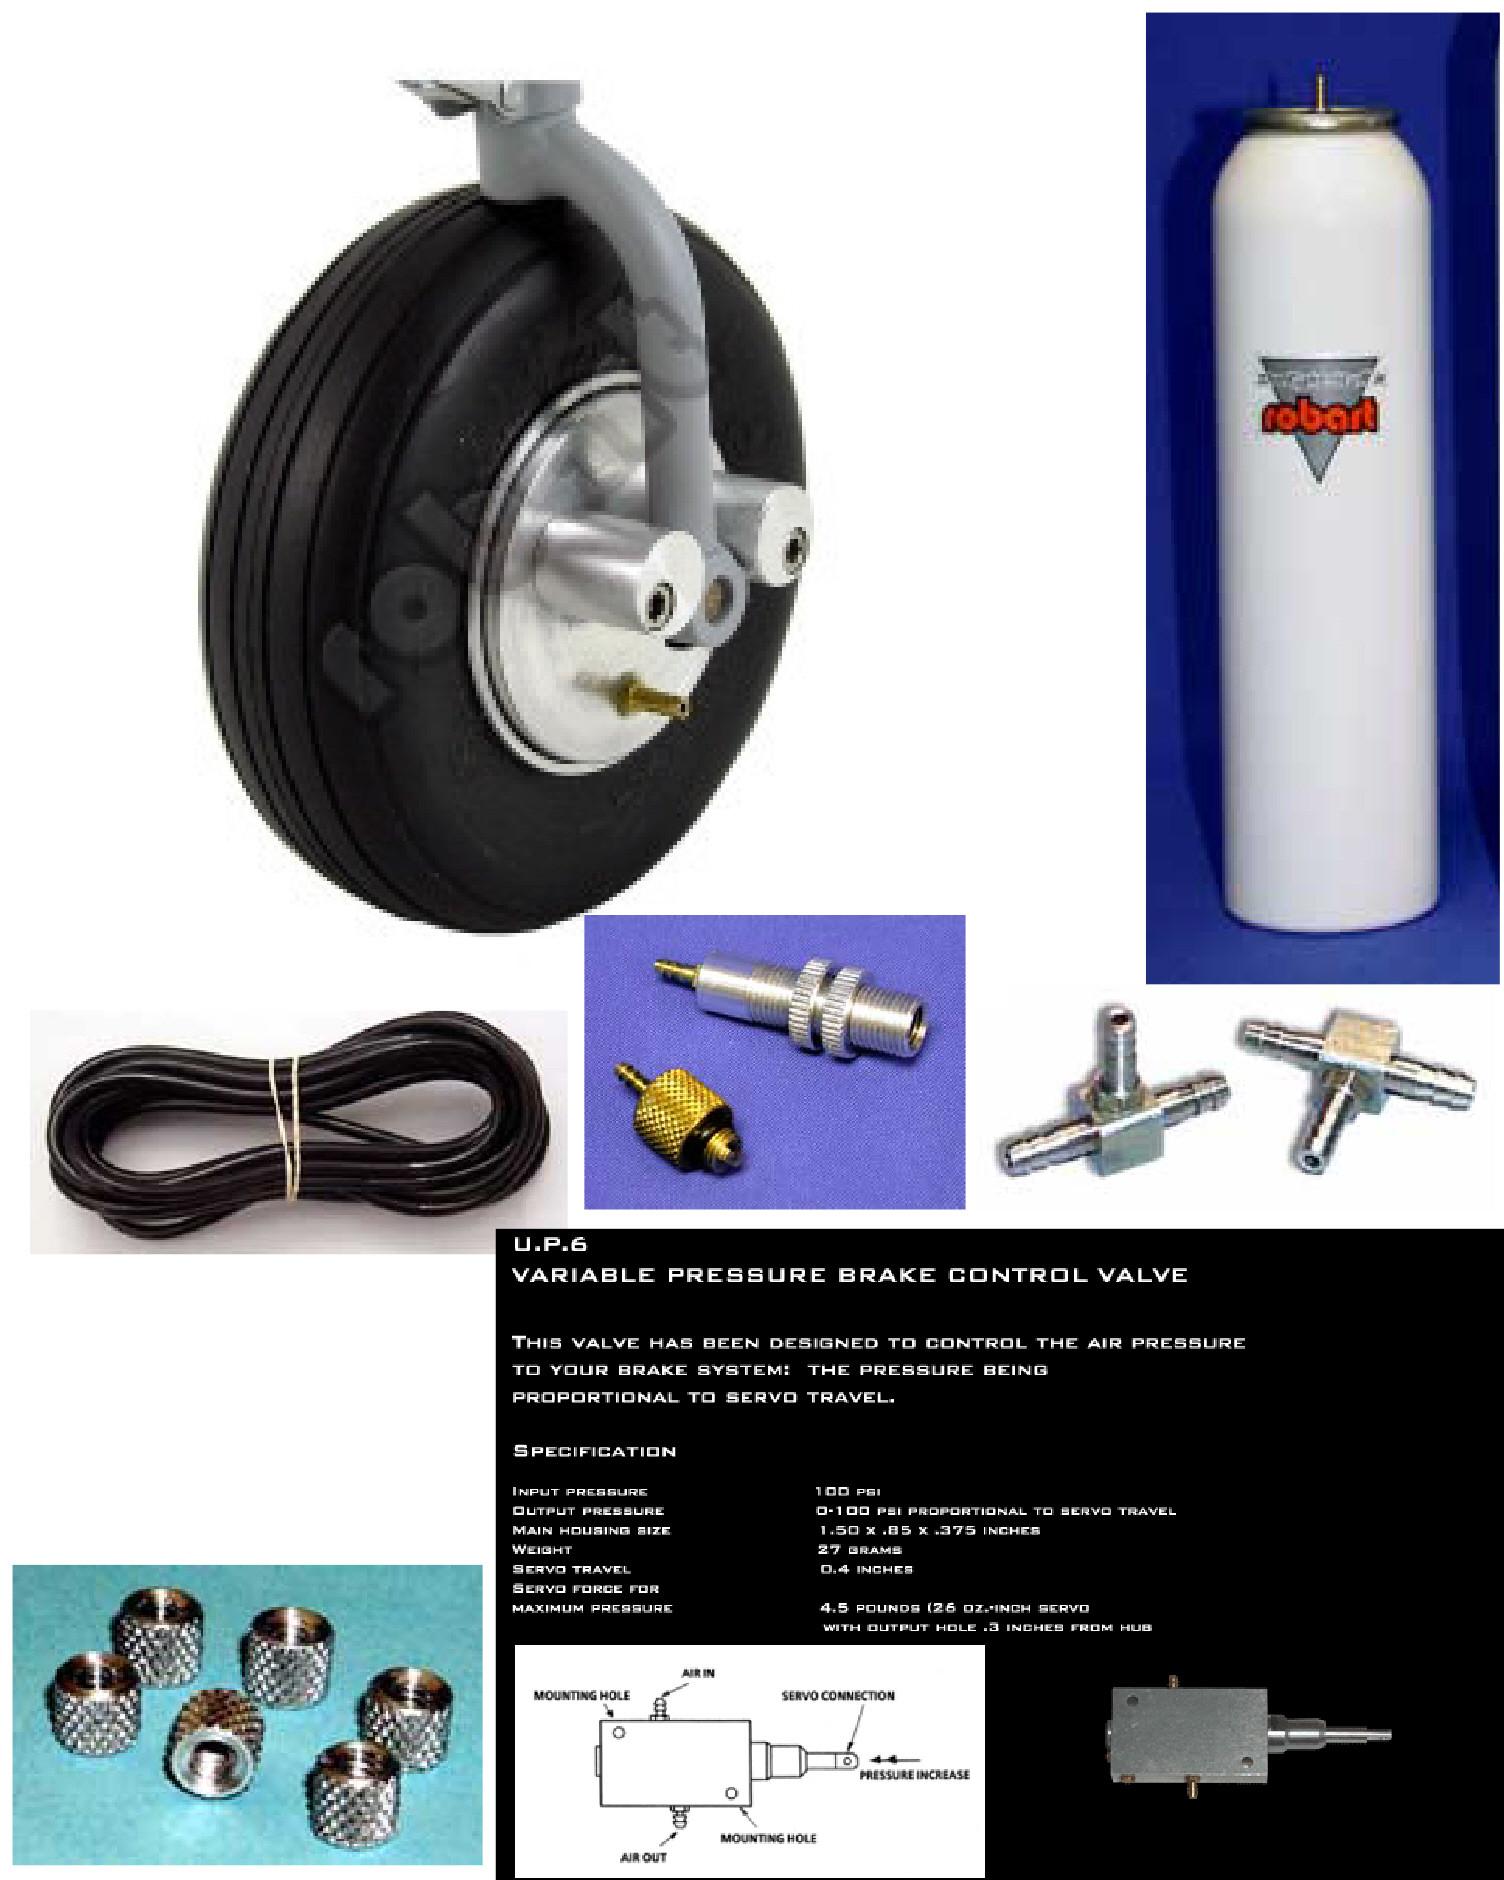 Brakes: Robart #143-1 (Brakes, UPS valve, Air Kit)